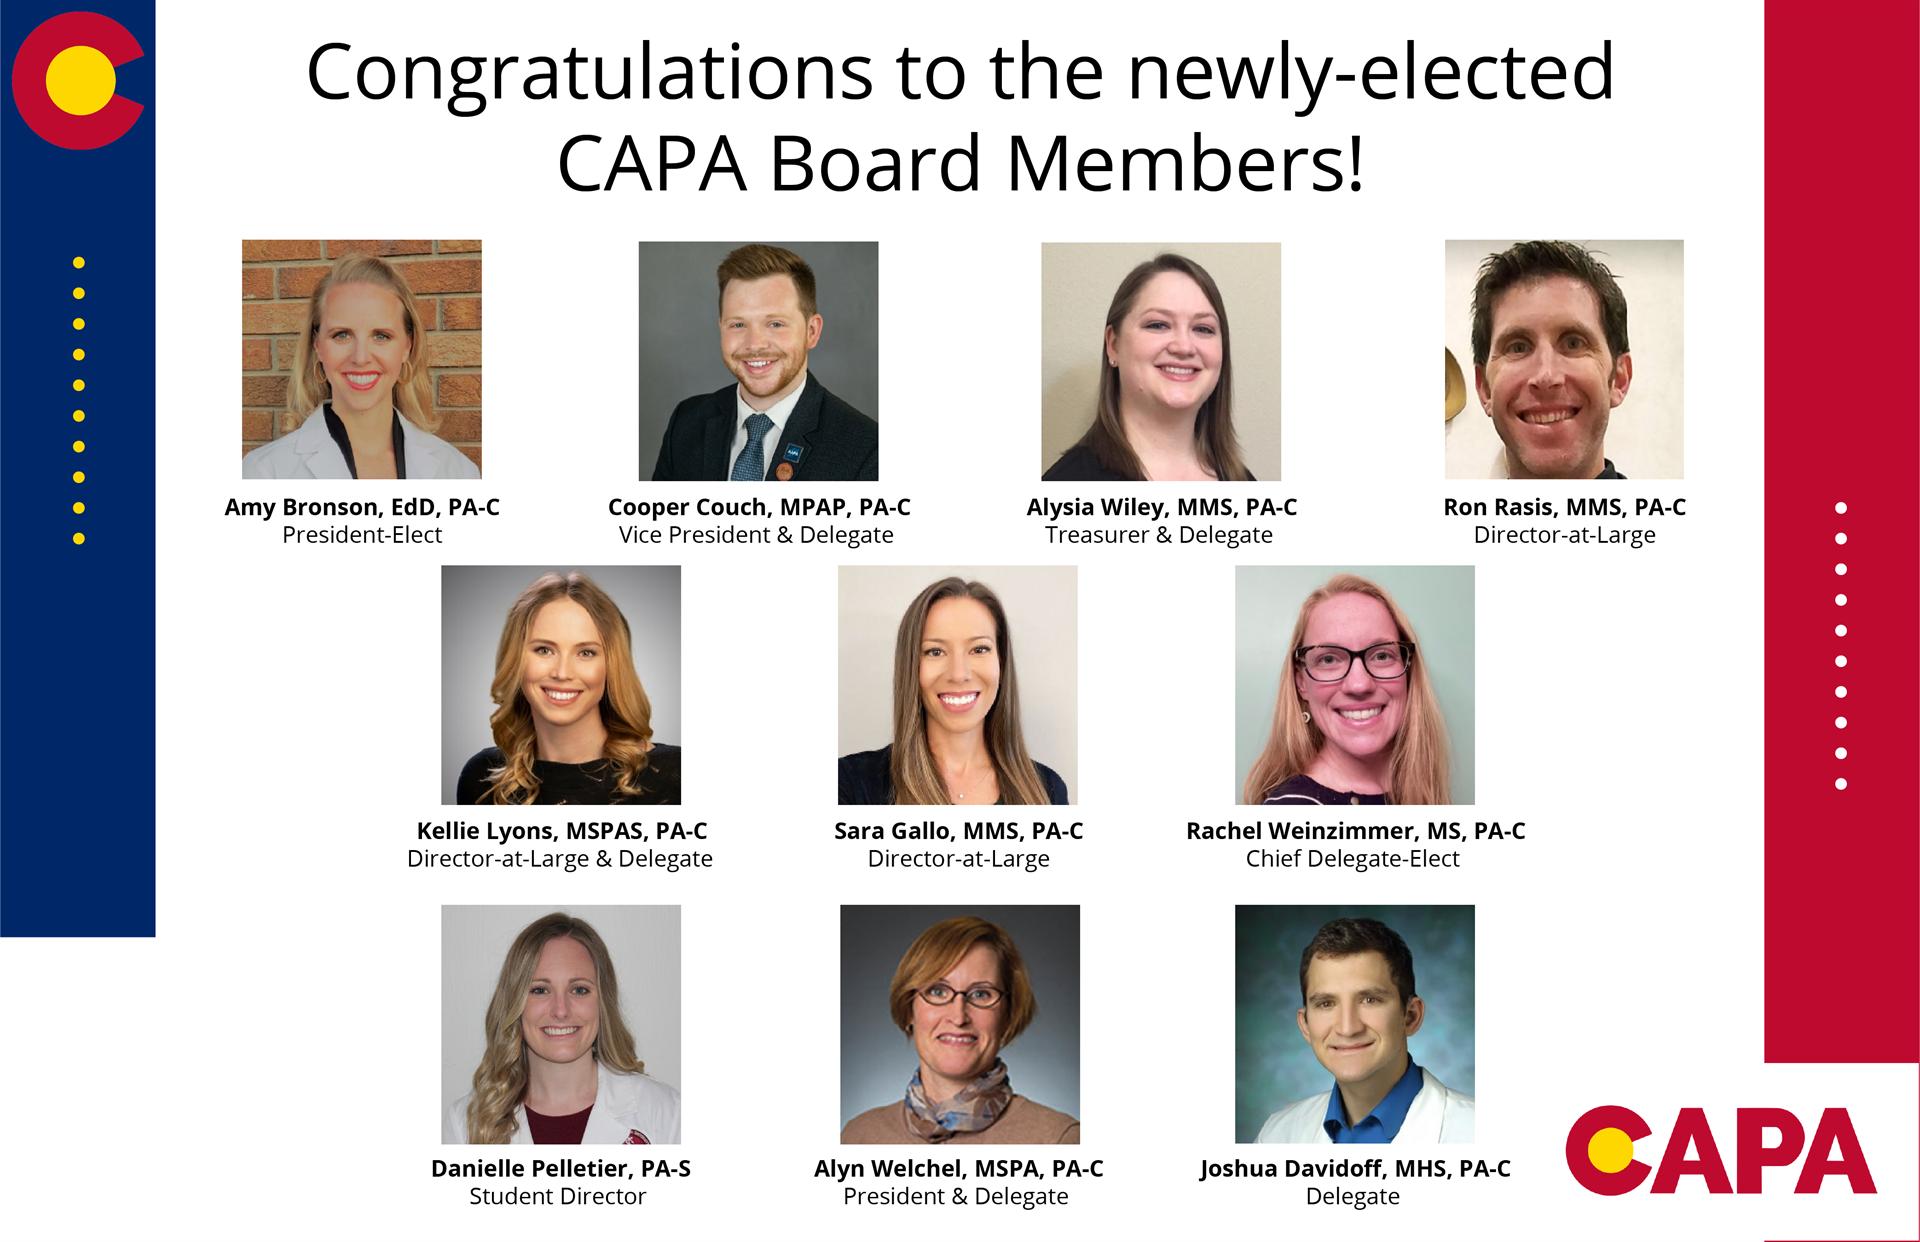 Newley-Elected CAPA Board Members